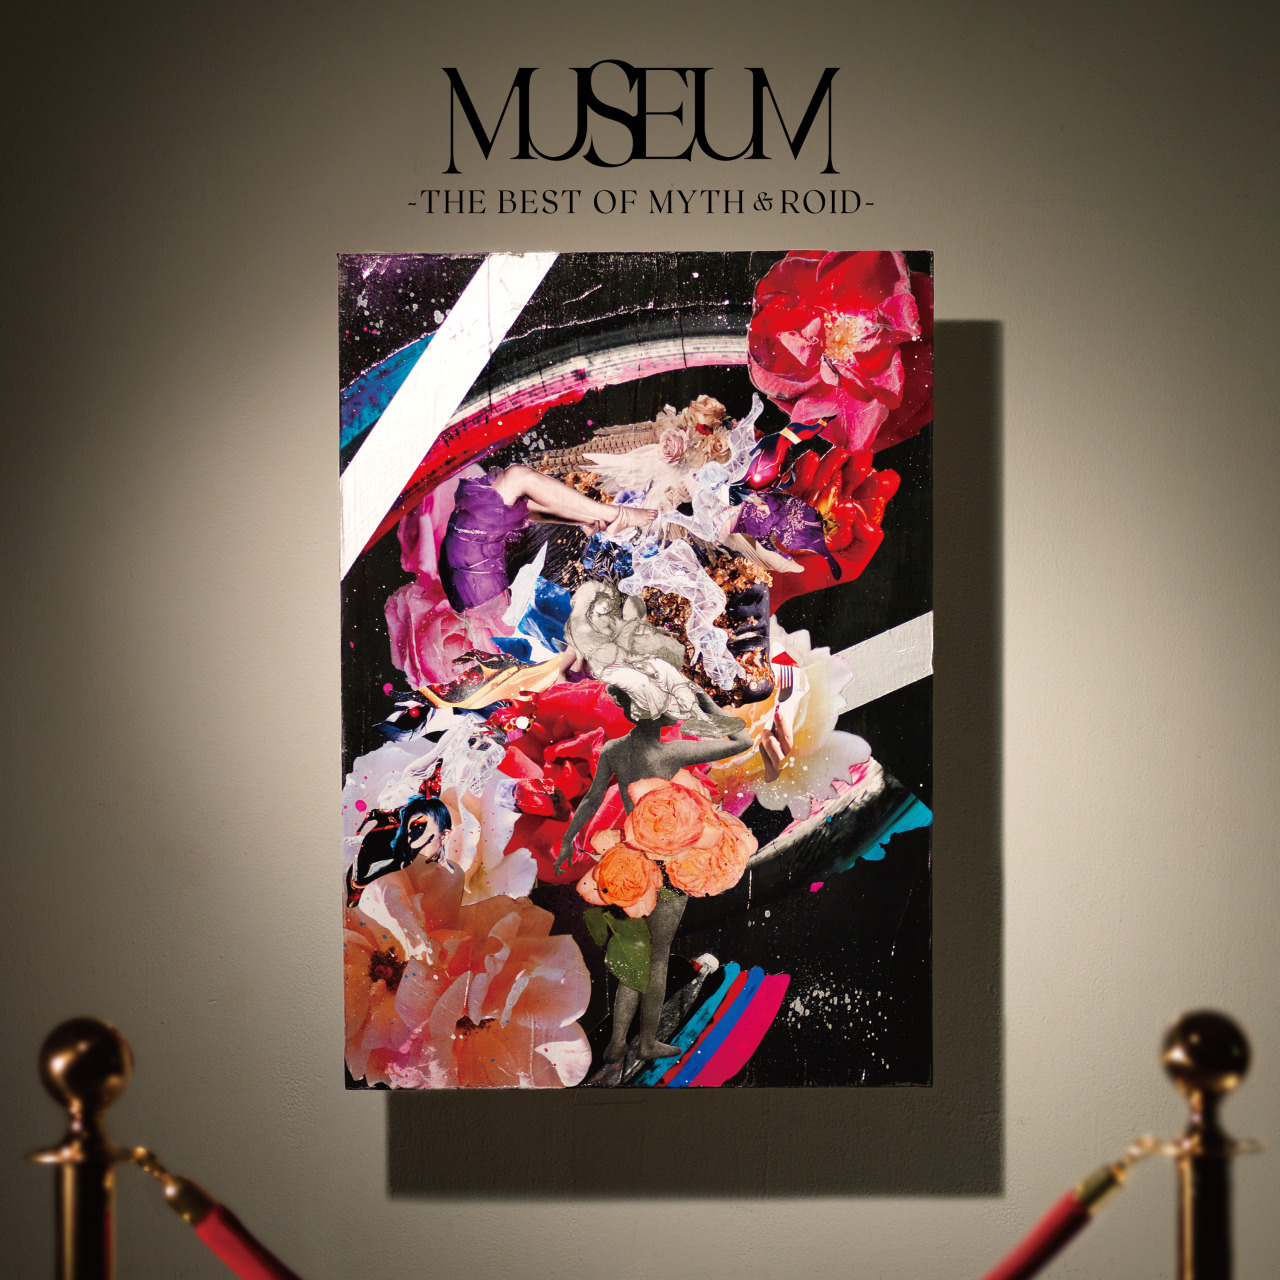 MYTH & ROID 「MUSEUM-THE BEST OF MYTH & ROID-」CD Jacket